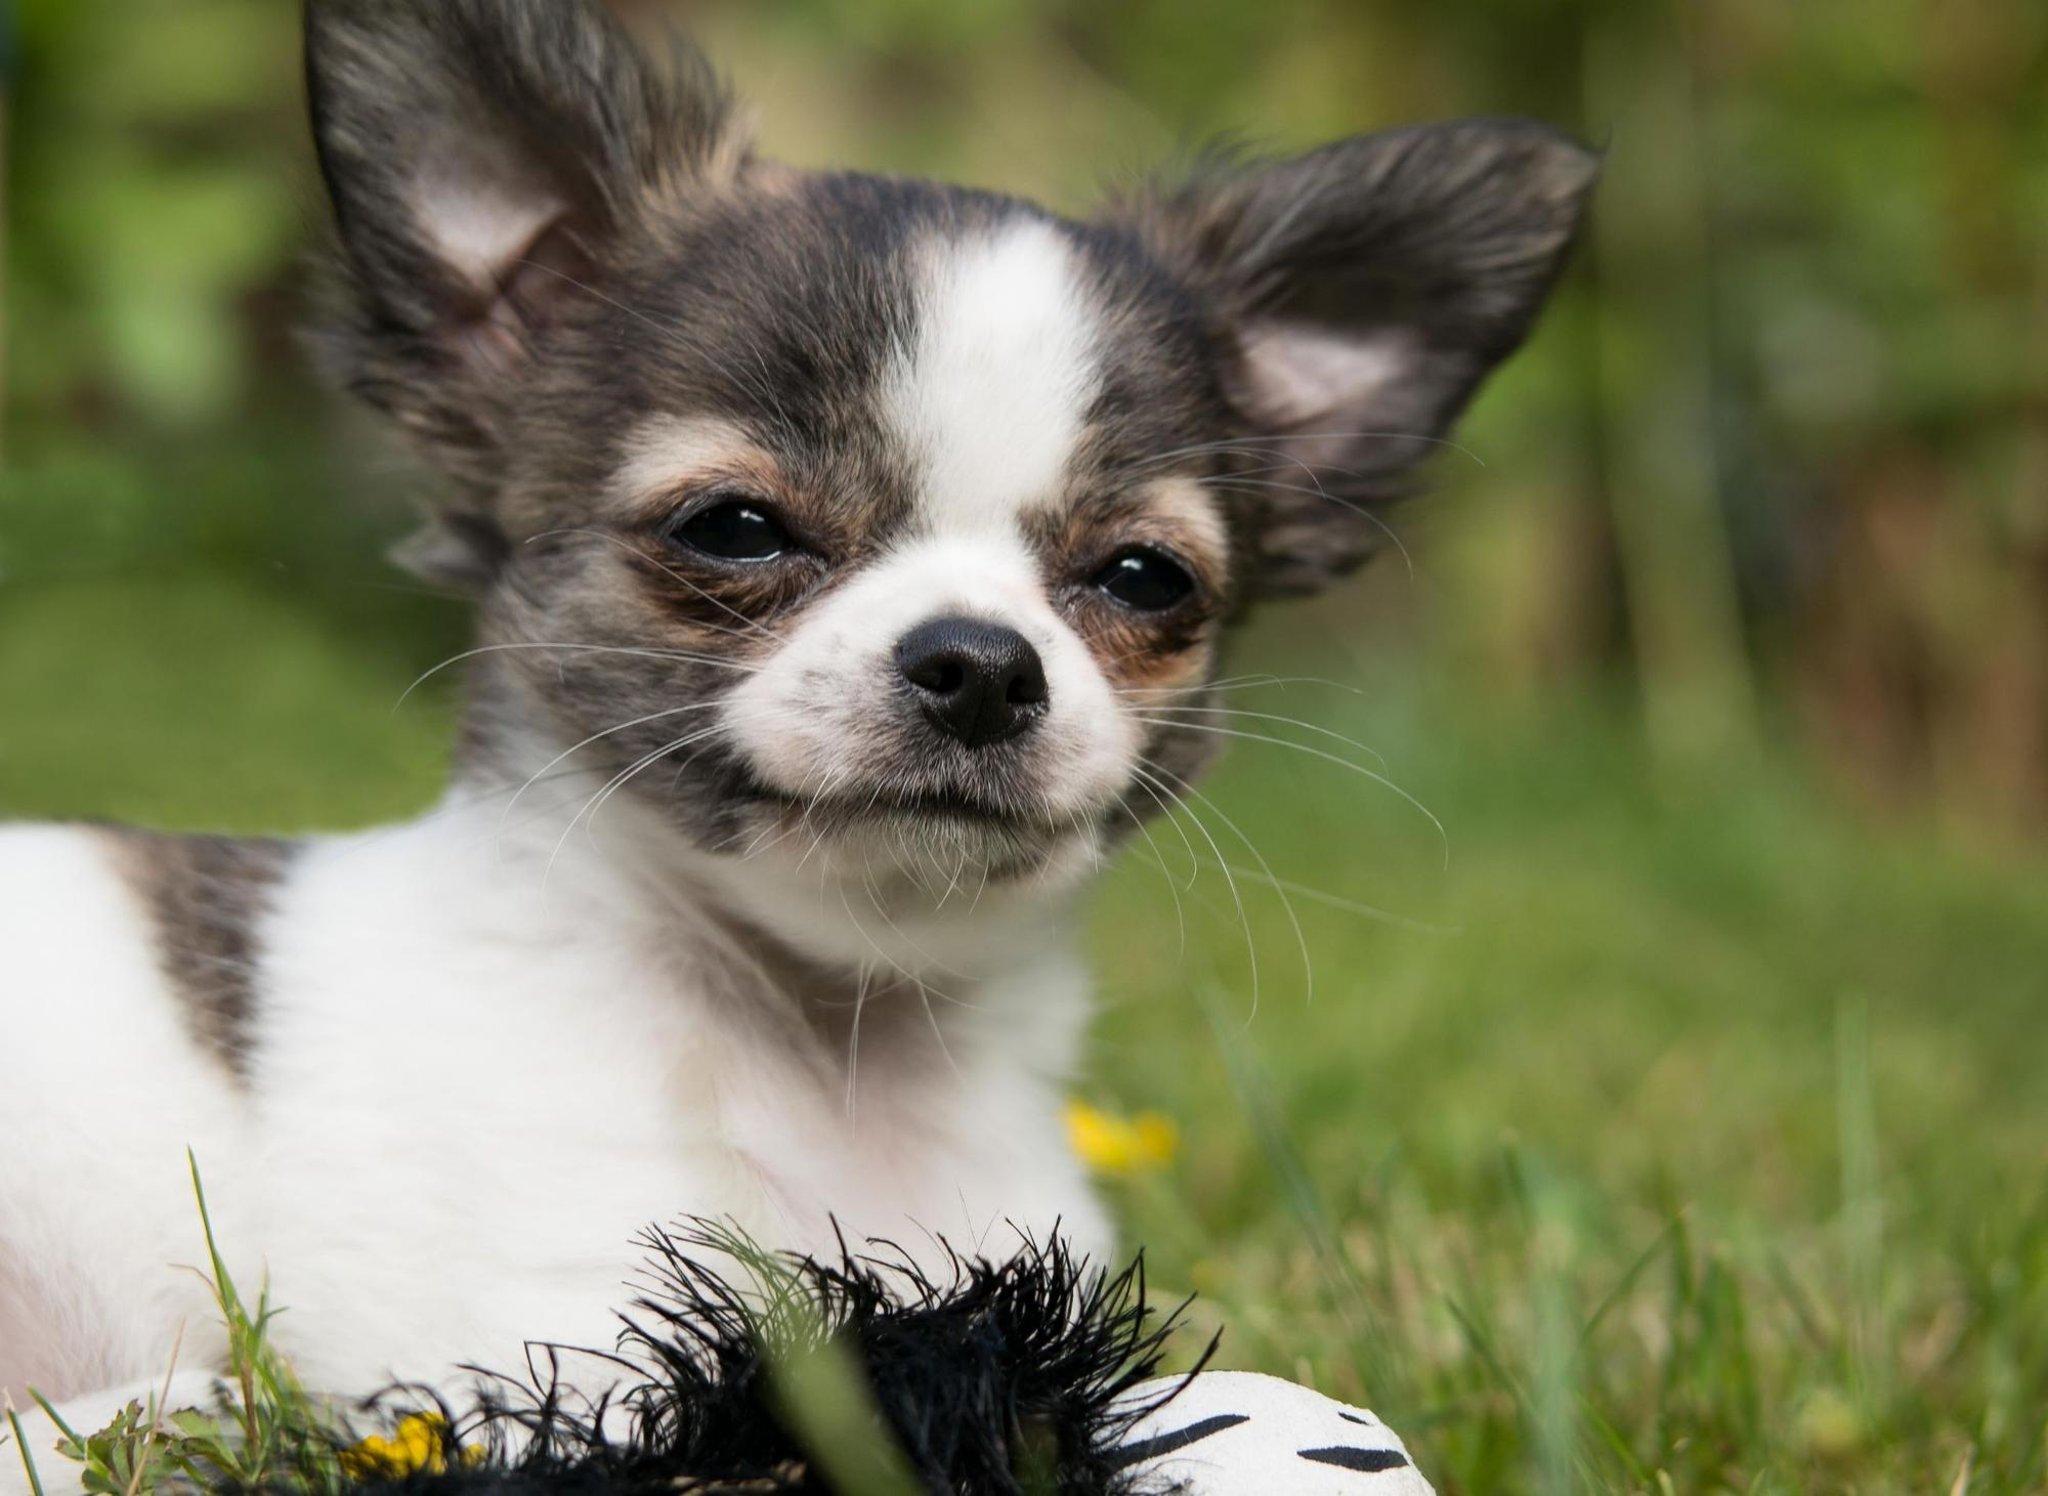 Fakta Chihuahua: 10 hal menarik yang tidak Anda ketahui tentang jenis anjing yang menggemaskan dan suka diemong